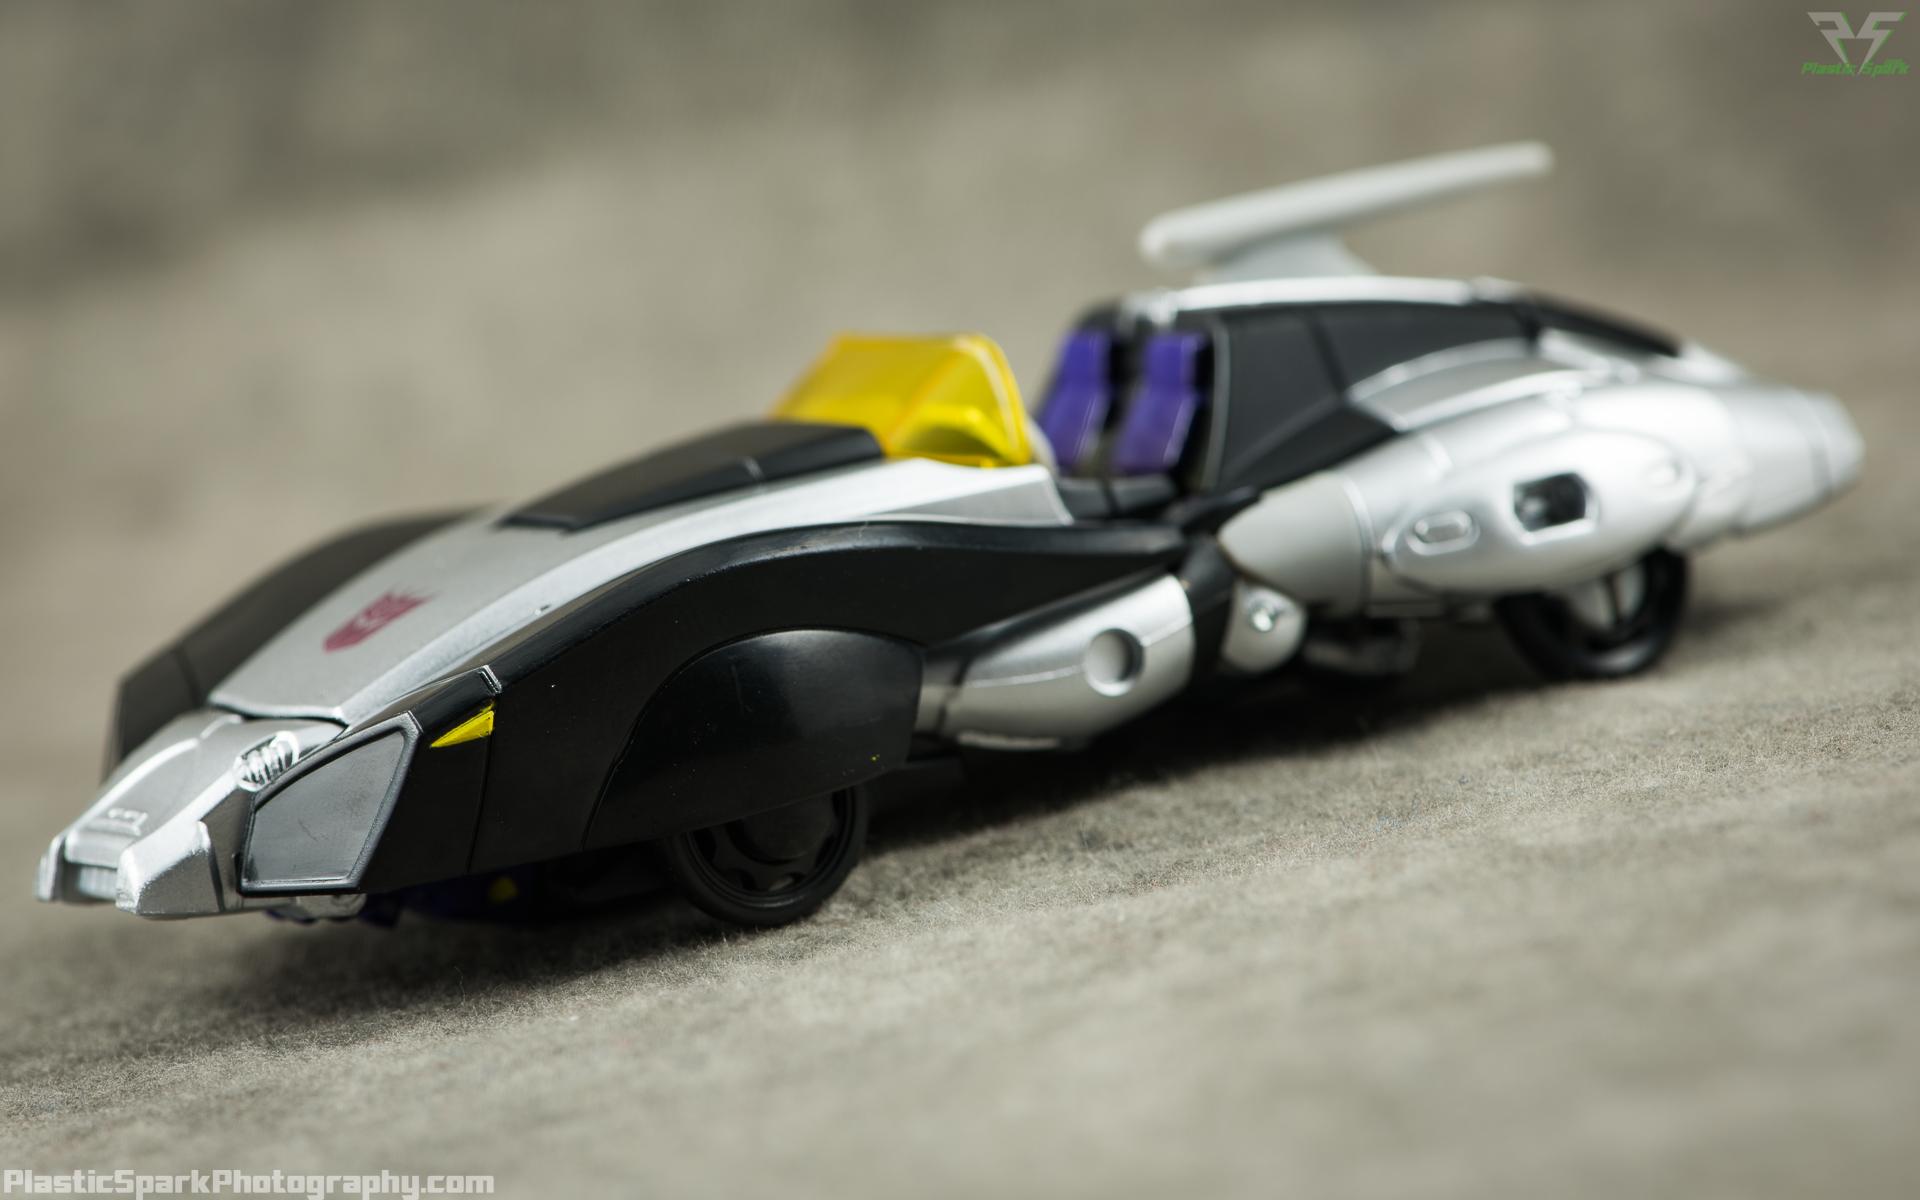 Takara-LG15-Nightbird-Shadow-(1-of-11).png